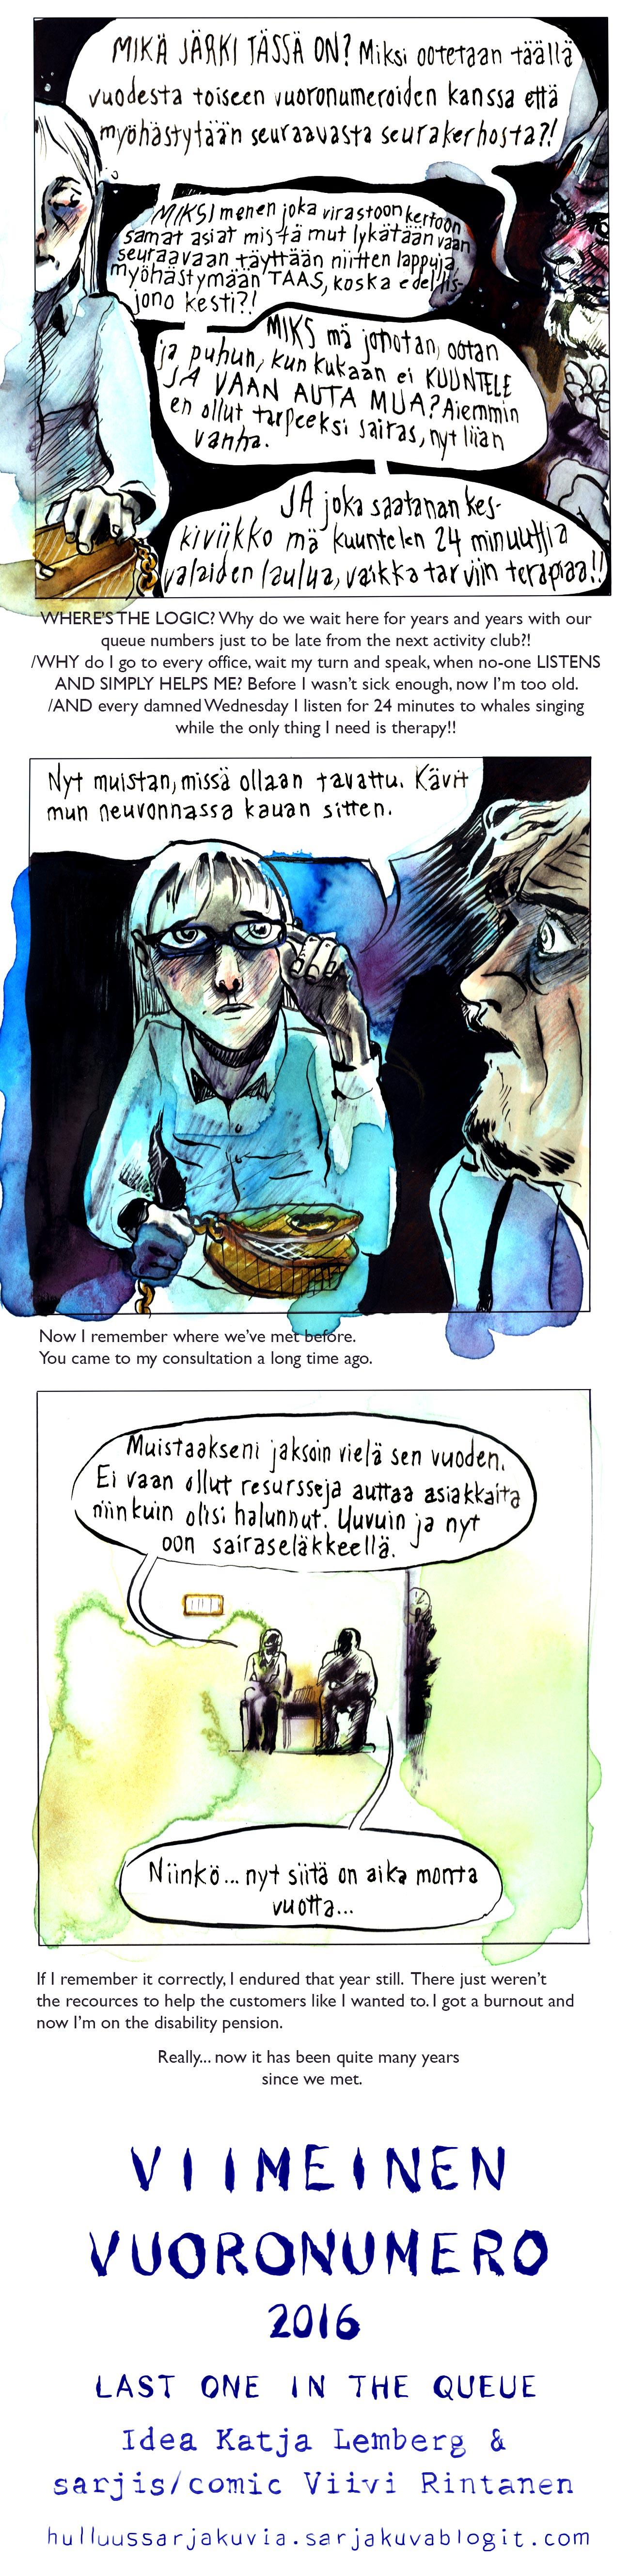 sarjispohja-blogiin-kATJA6